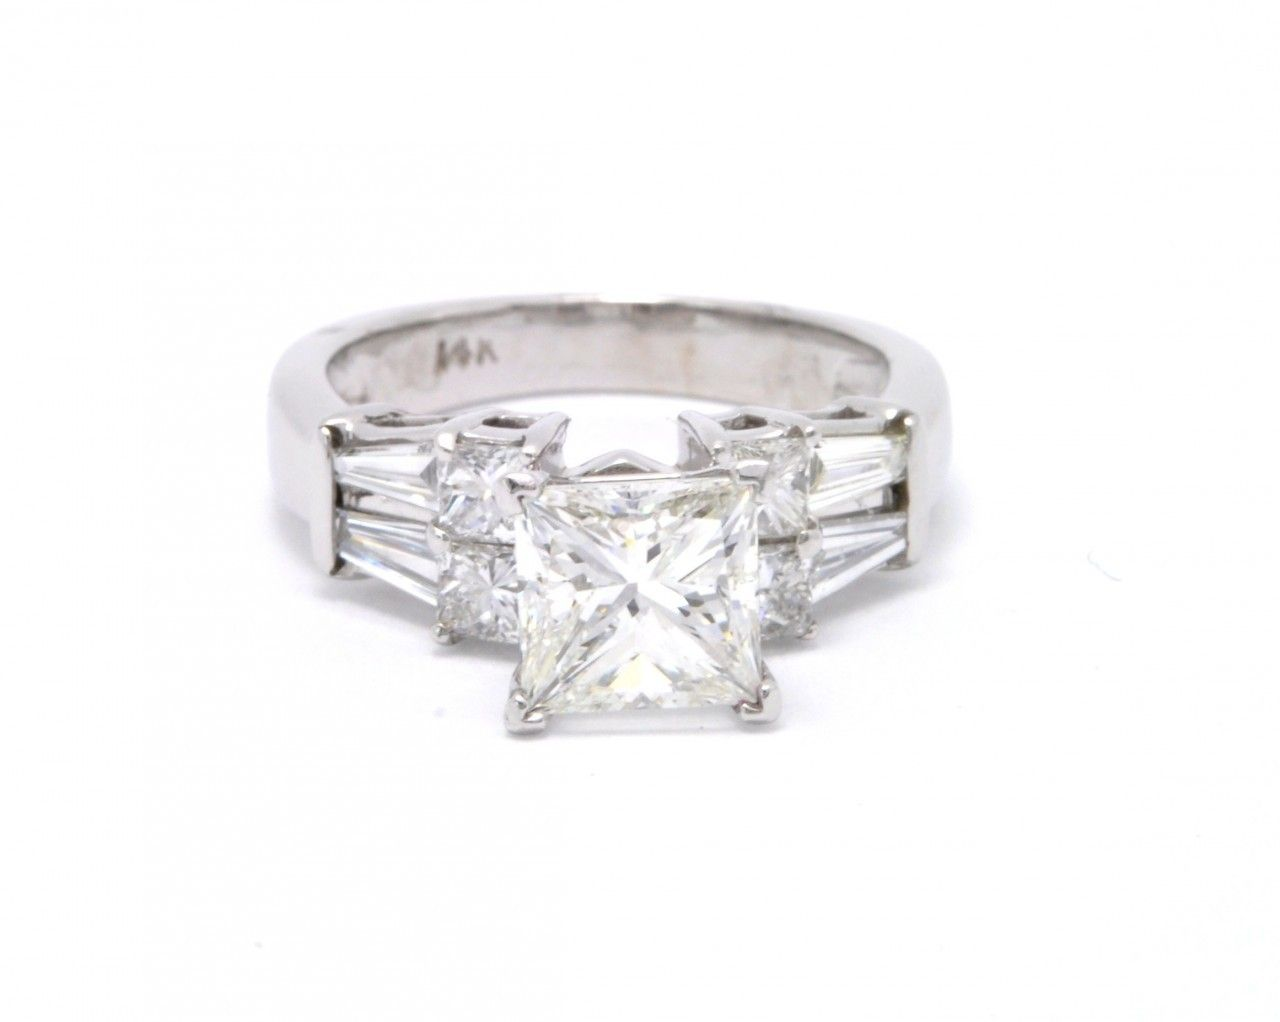 (http://shop.shinjewelers.com/11001032-14k-white-gold-gia-certified-diamond-engagement-ring/)